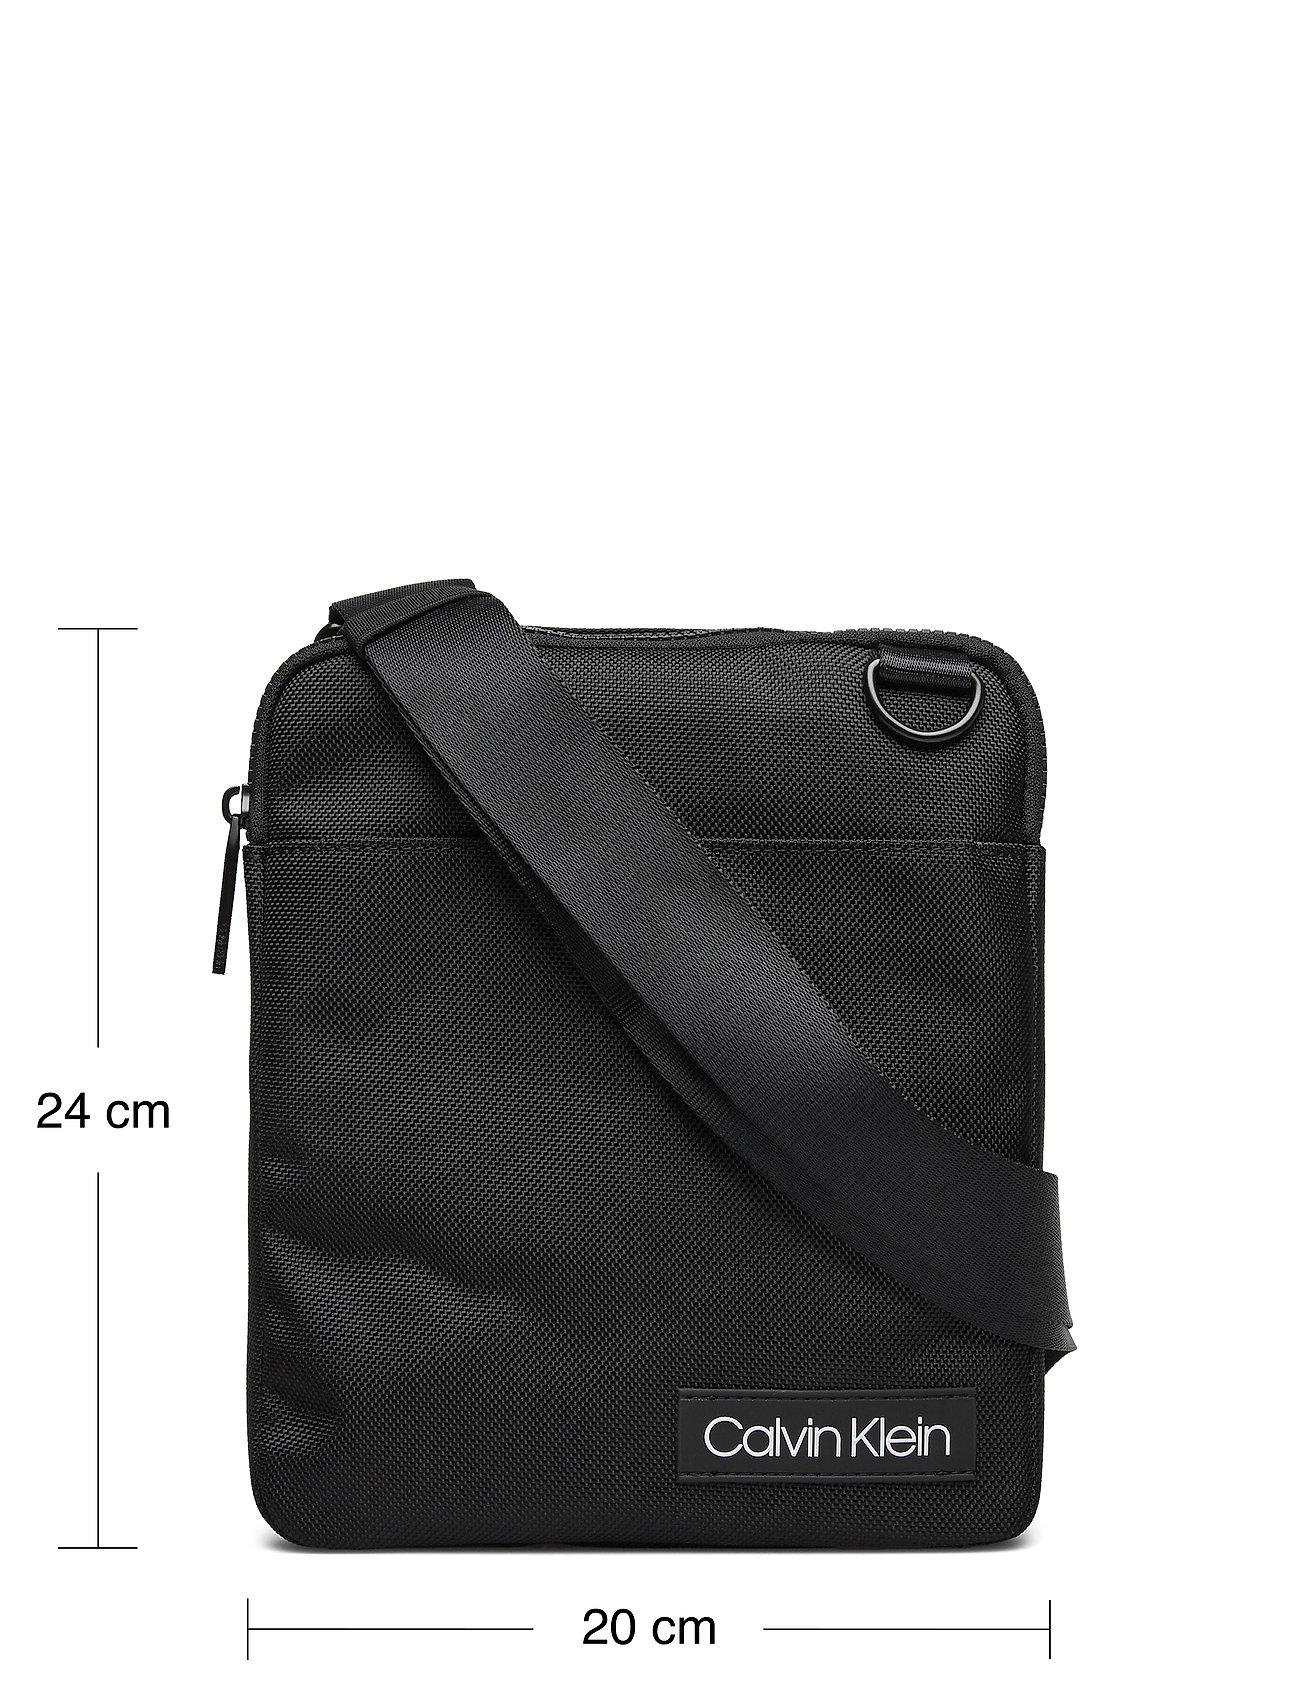 Calvin Klein - ULTIMATE NYLON FLAT - sacs à bandoulière - black - 5